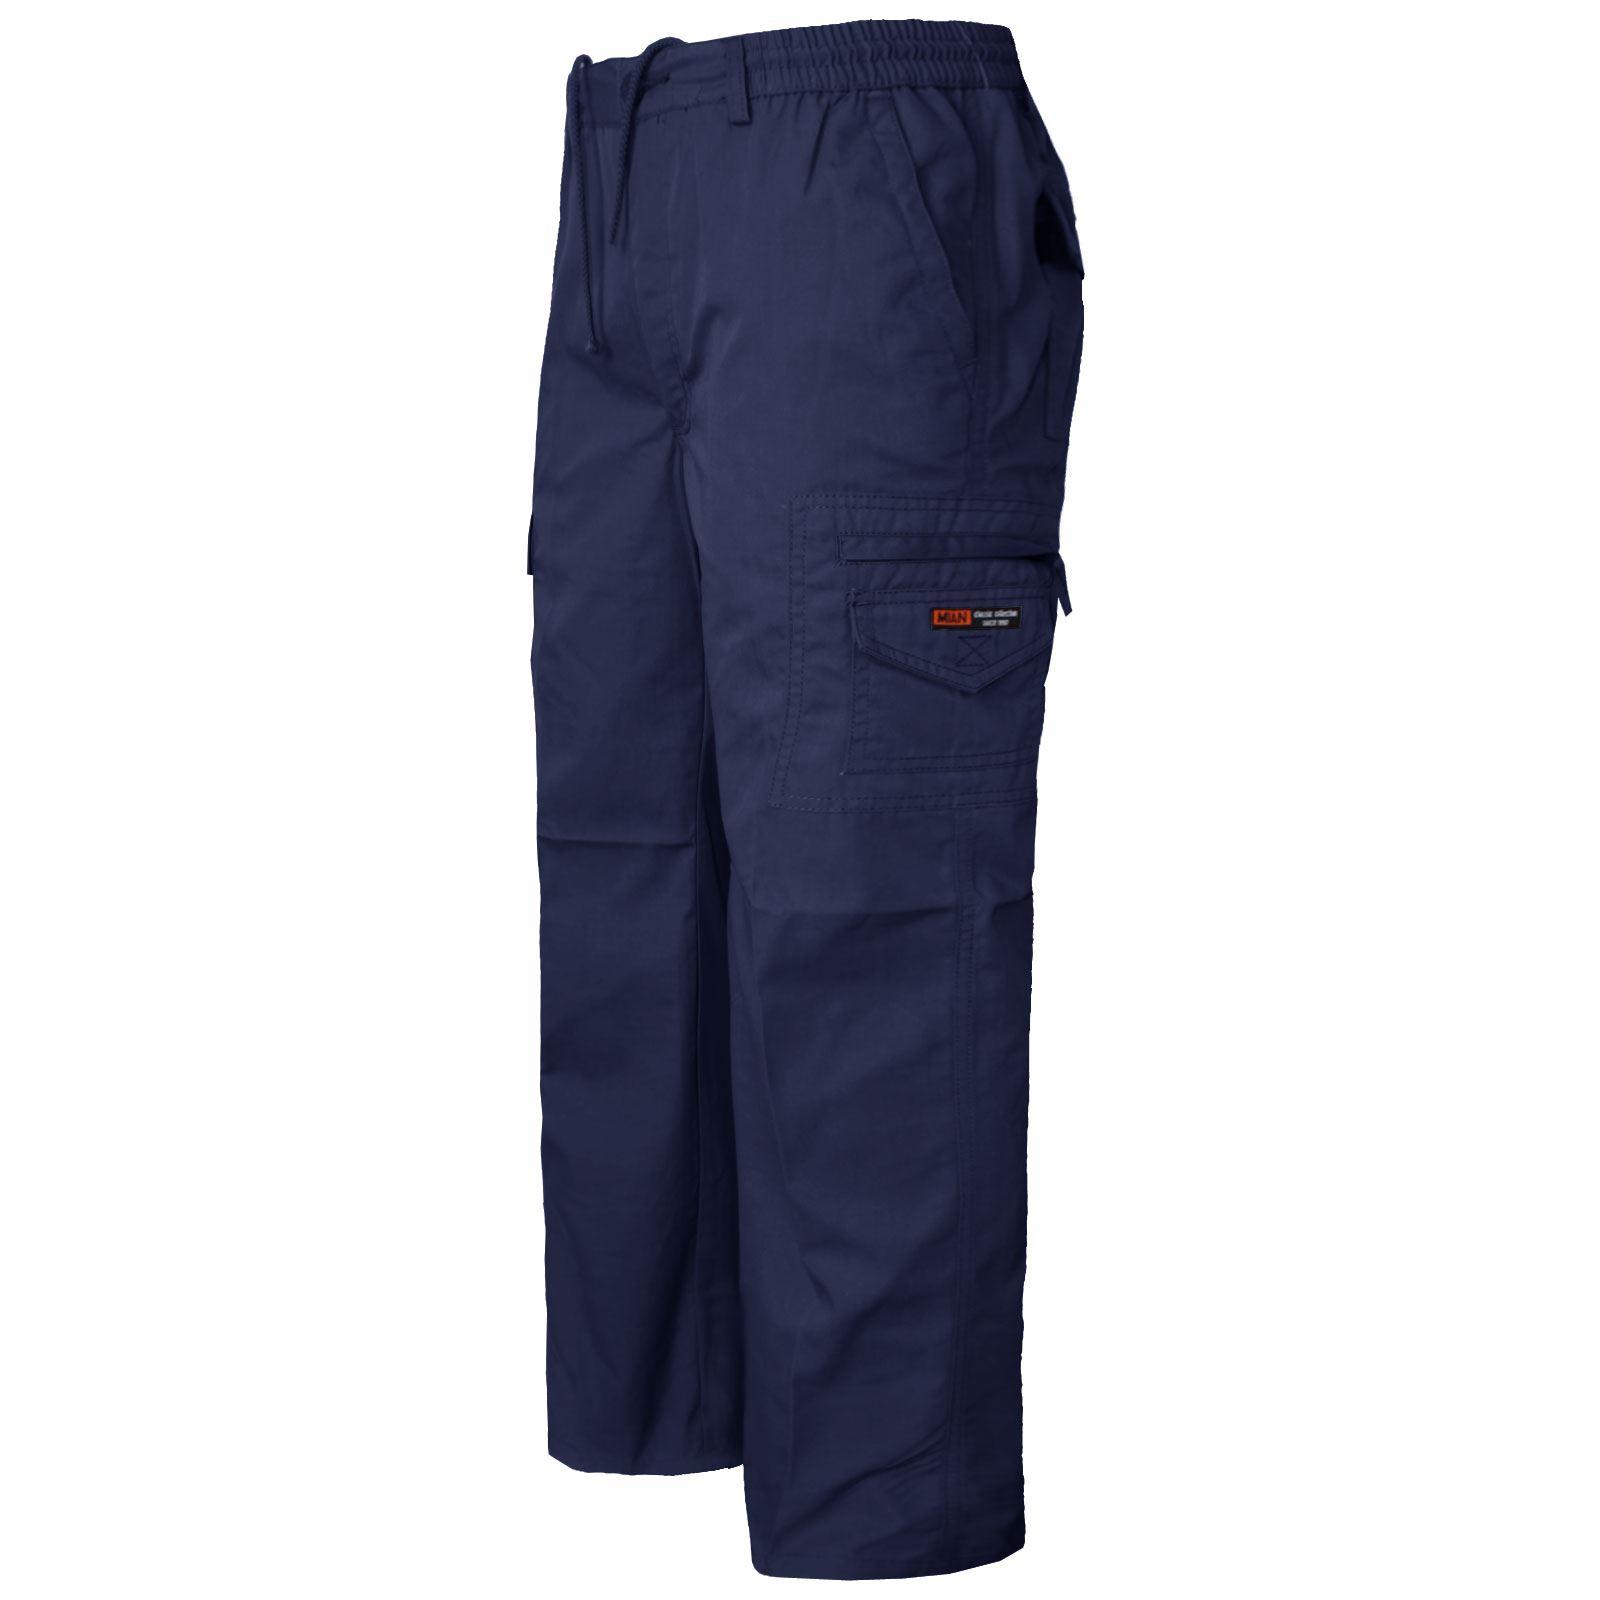 Mens Elasticated Summer Trousers Cargo Combat Work Casual Long Pants Sport Pants